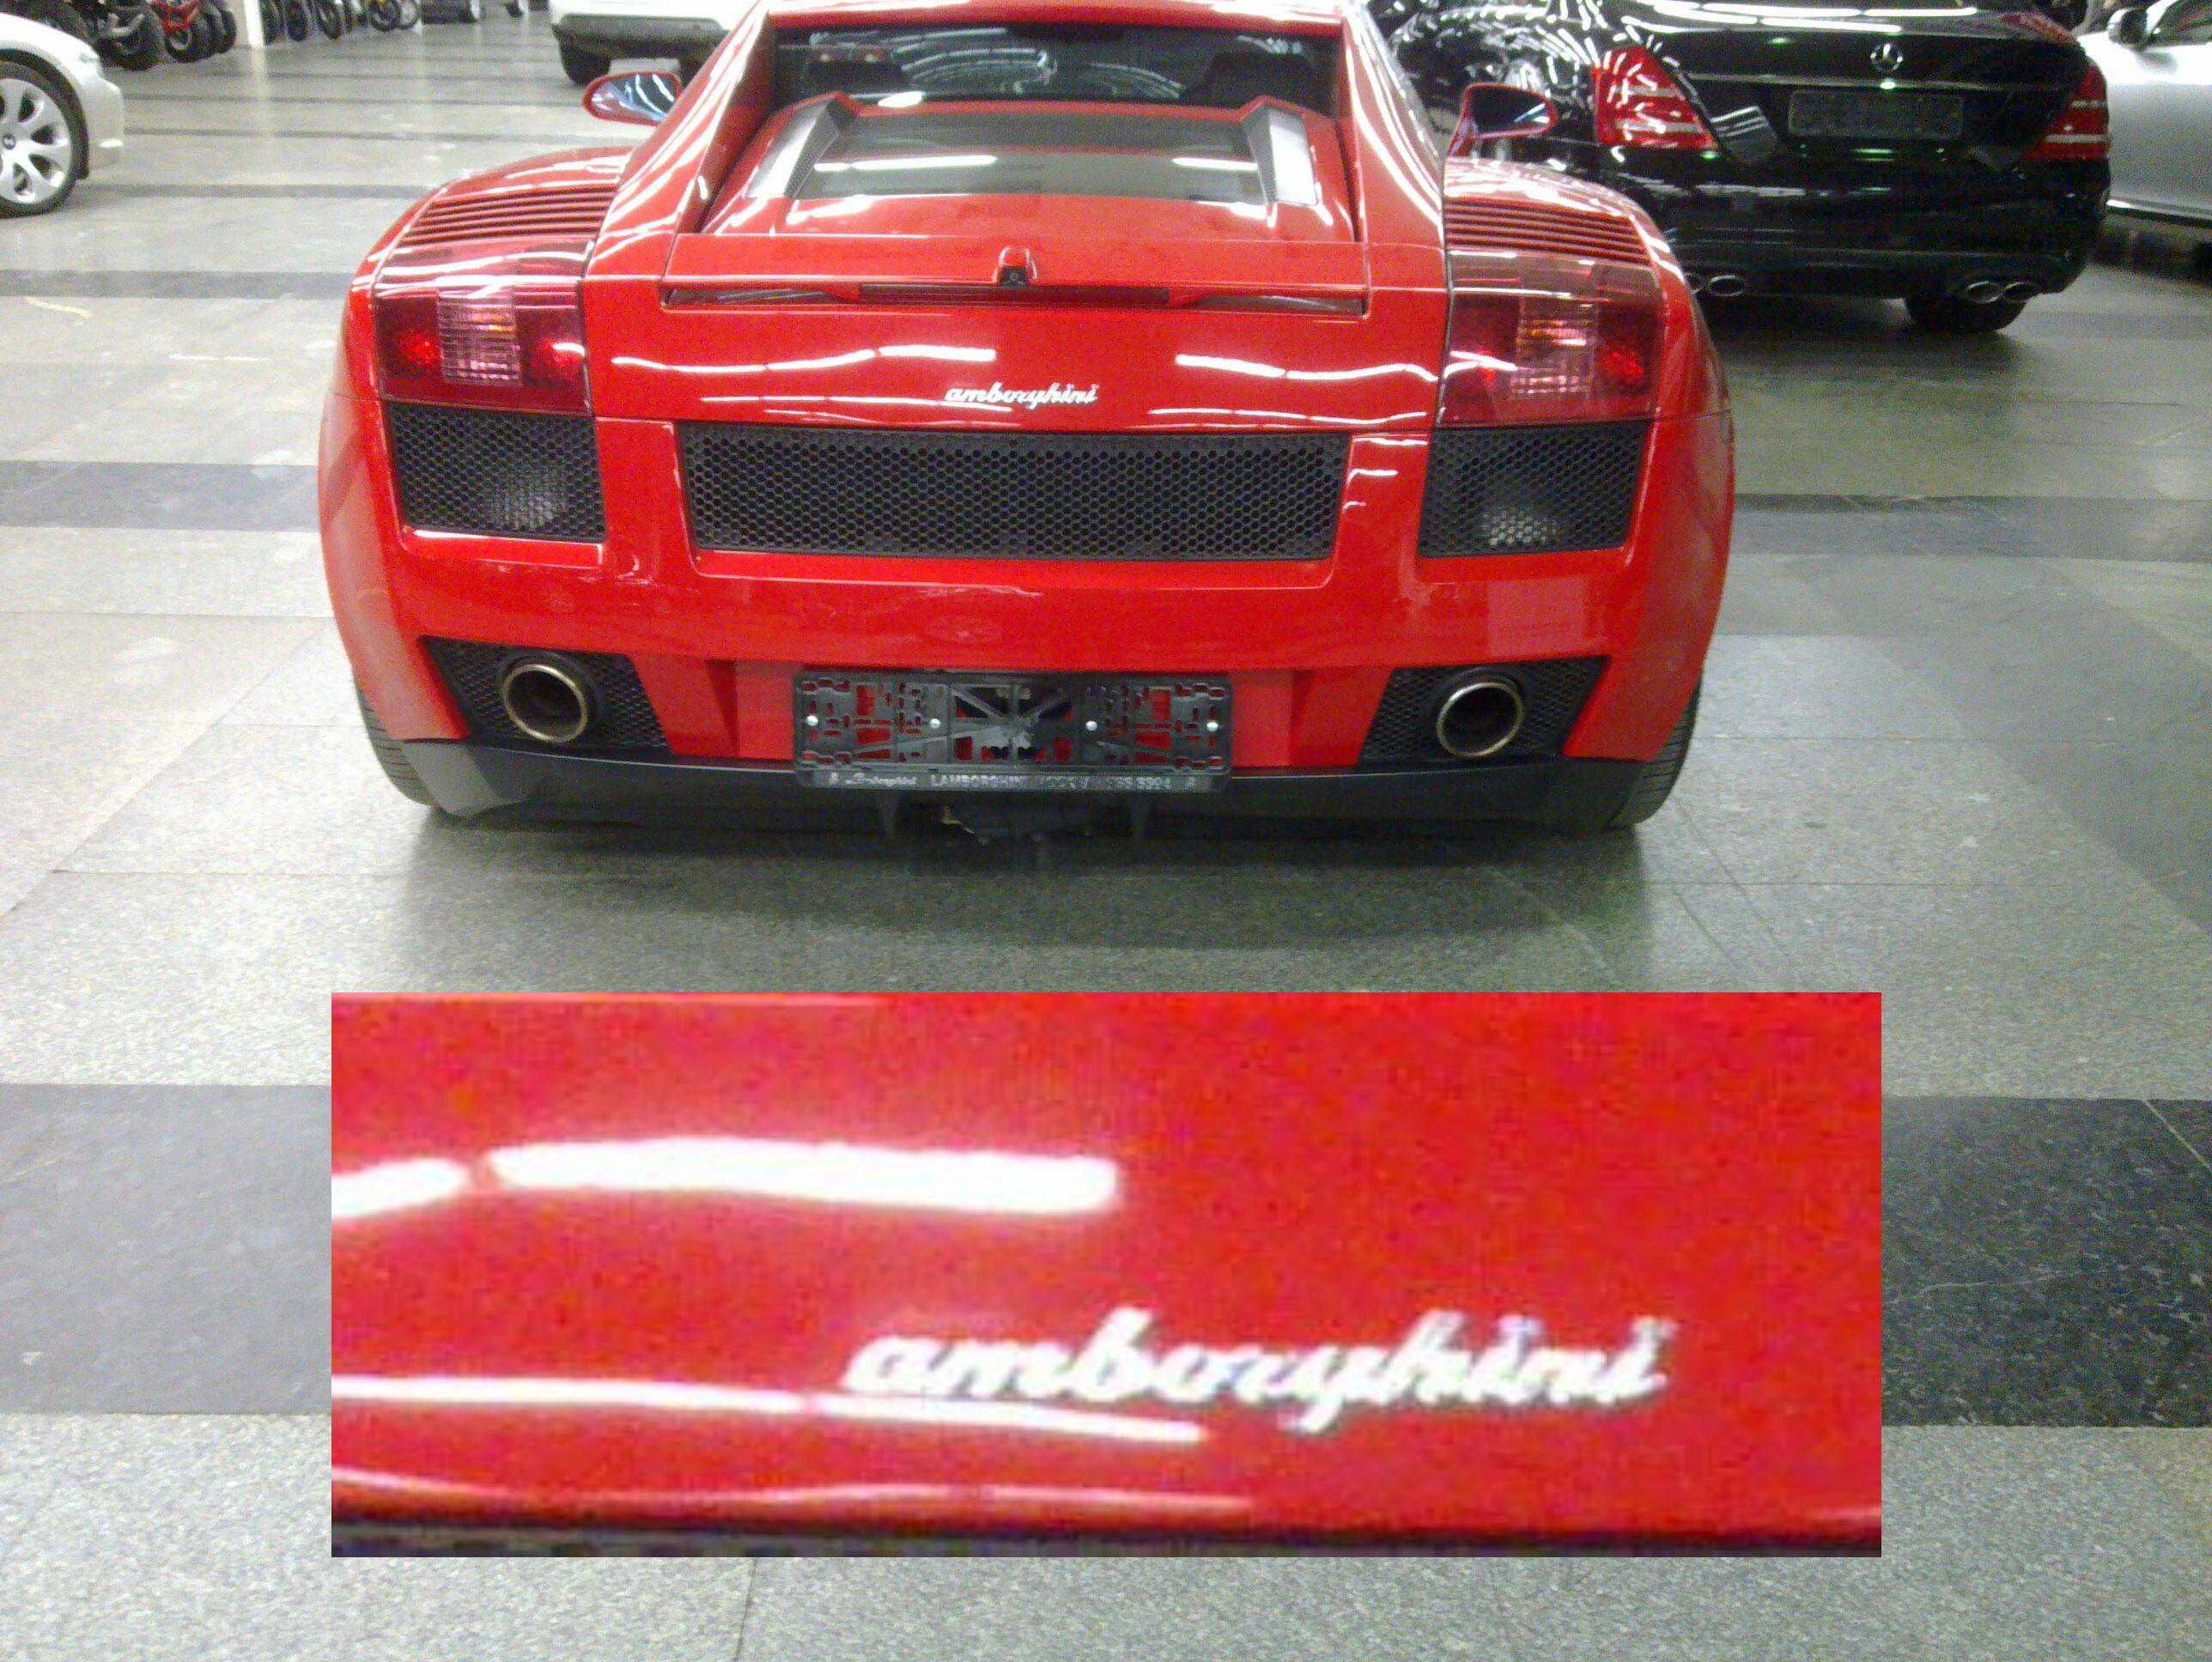 престижная элитная дорогая машина авто суперкар Lamborghini запчасти